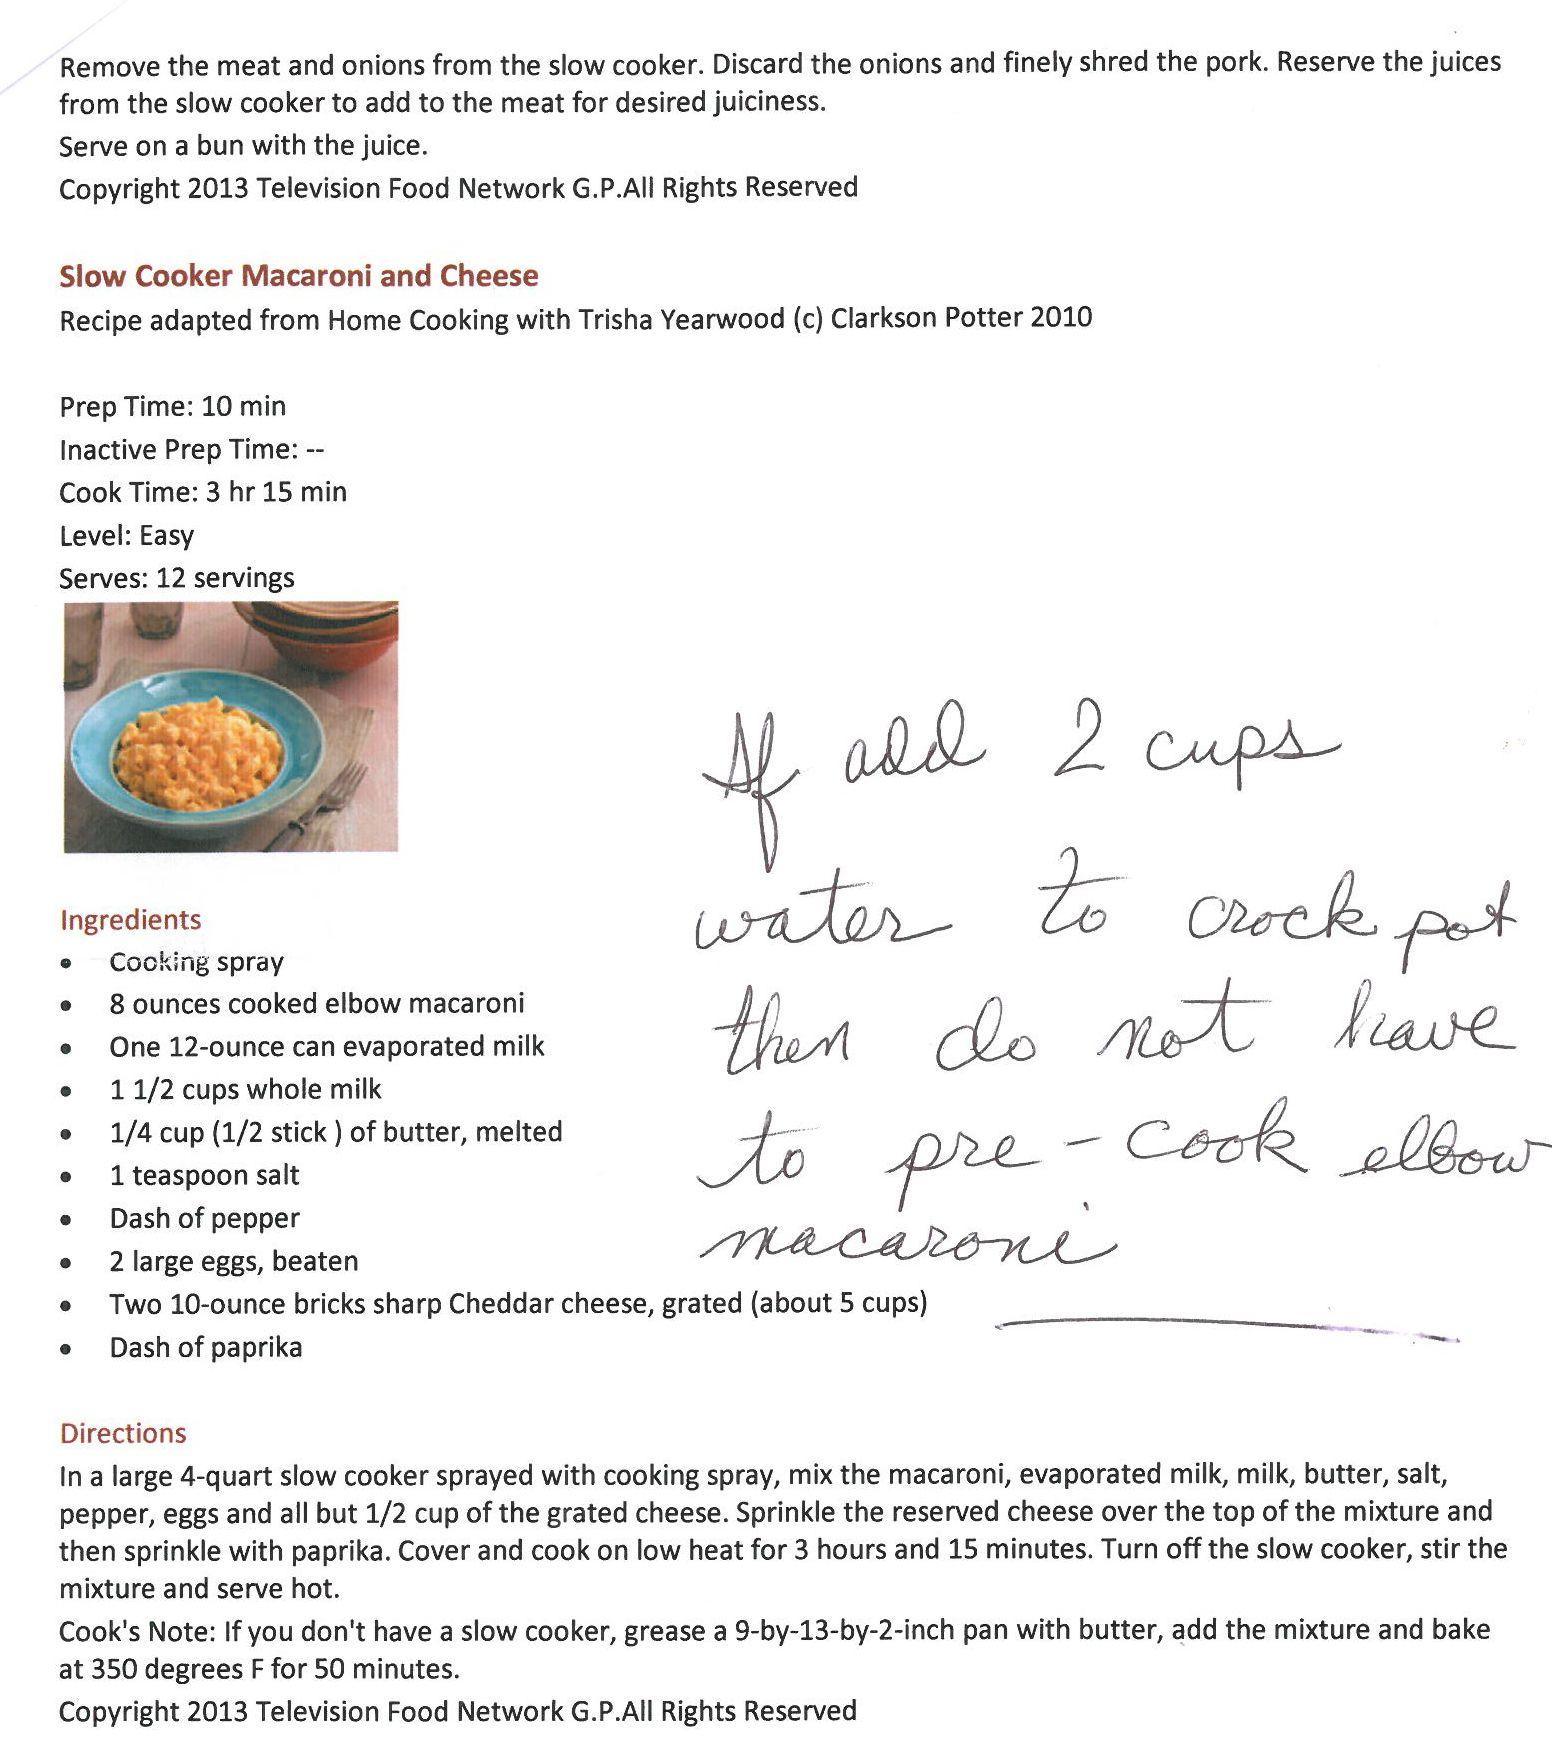 Crockpot Recipes, Mac And Cheese